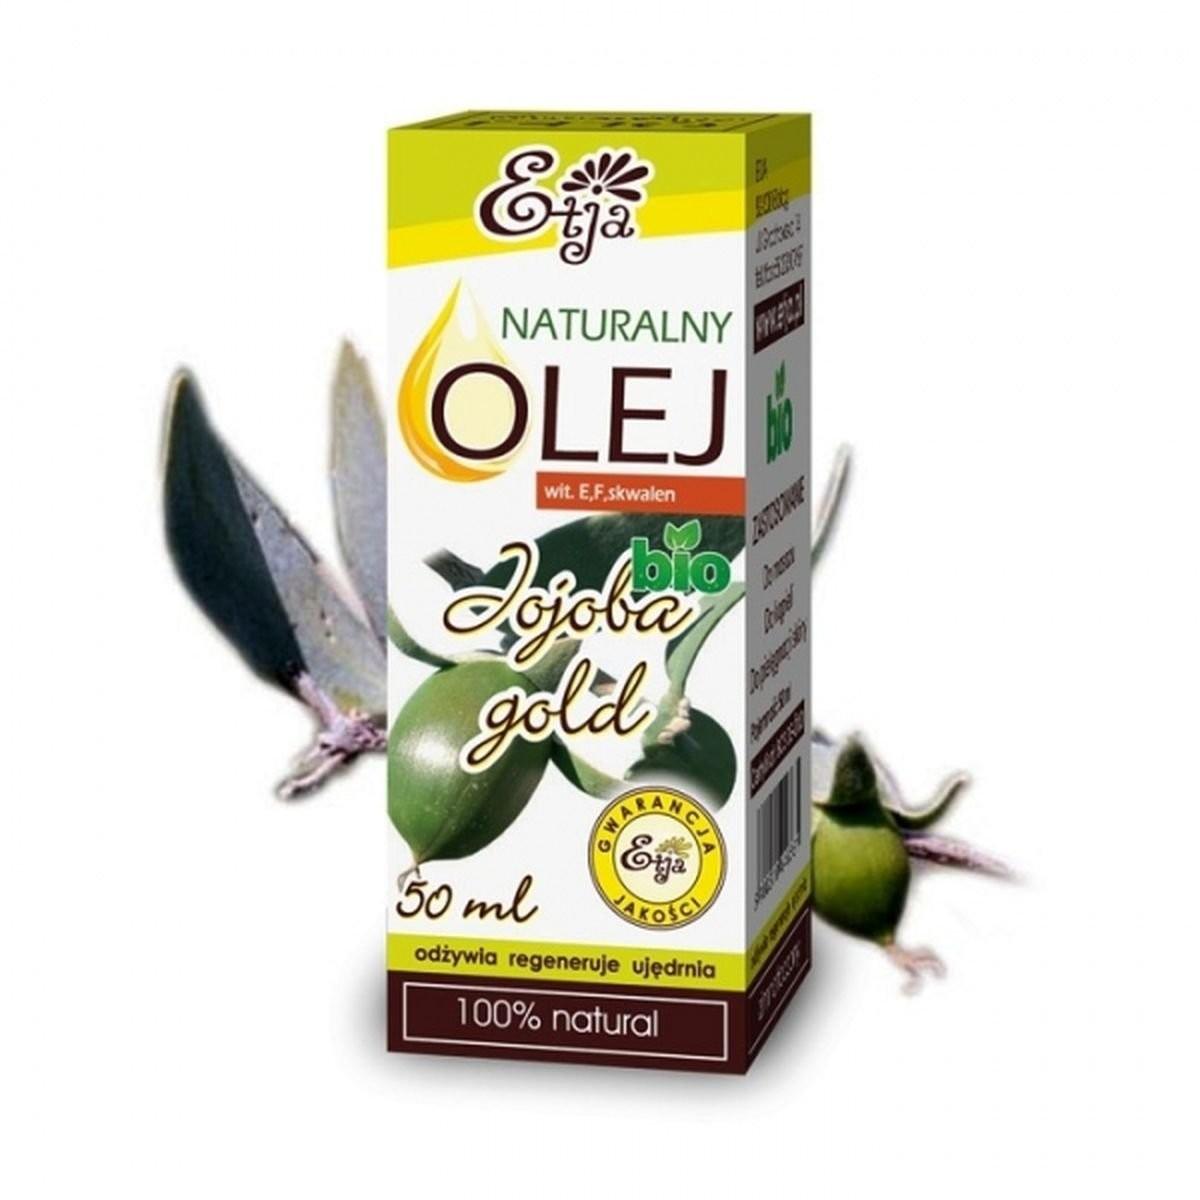 Etja olej jojoba Bio, 50 ml